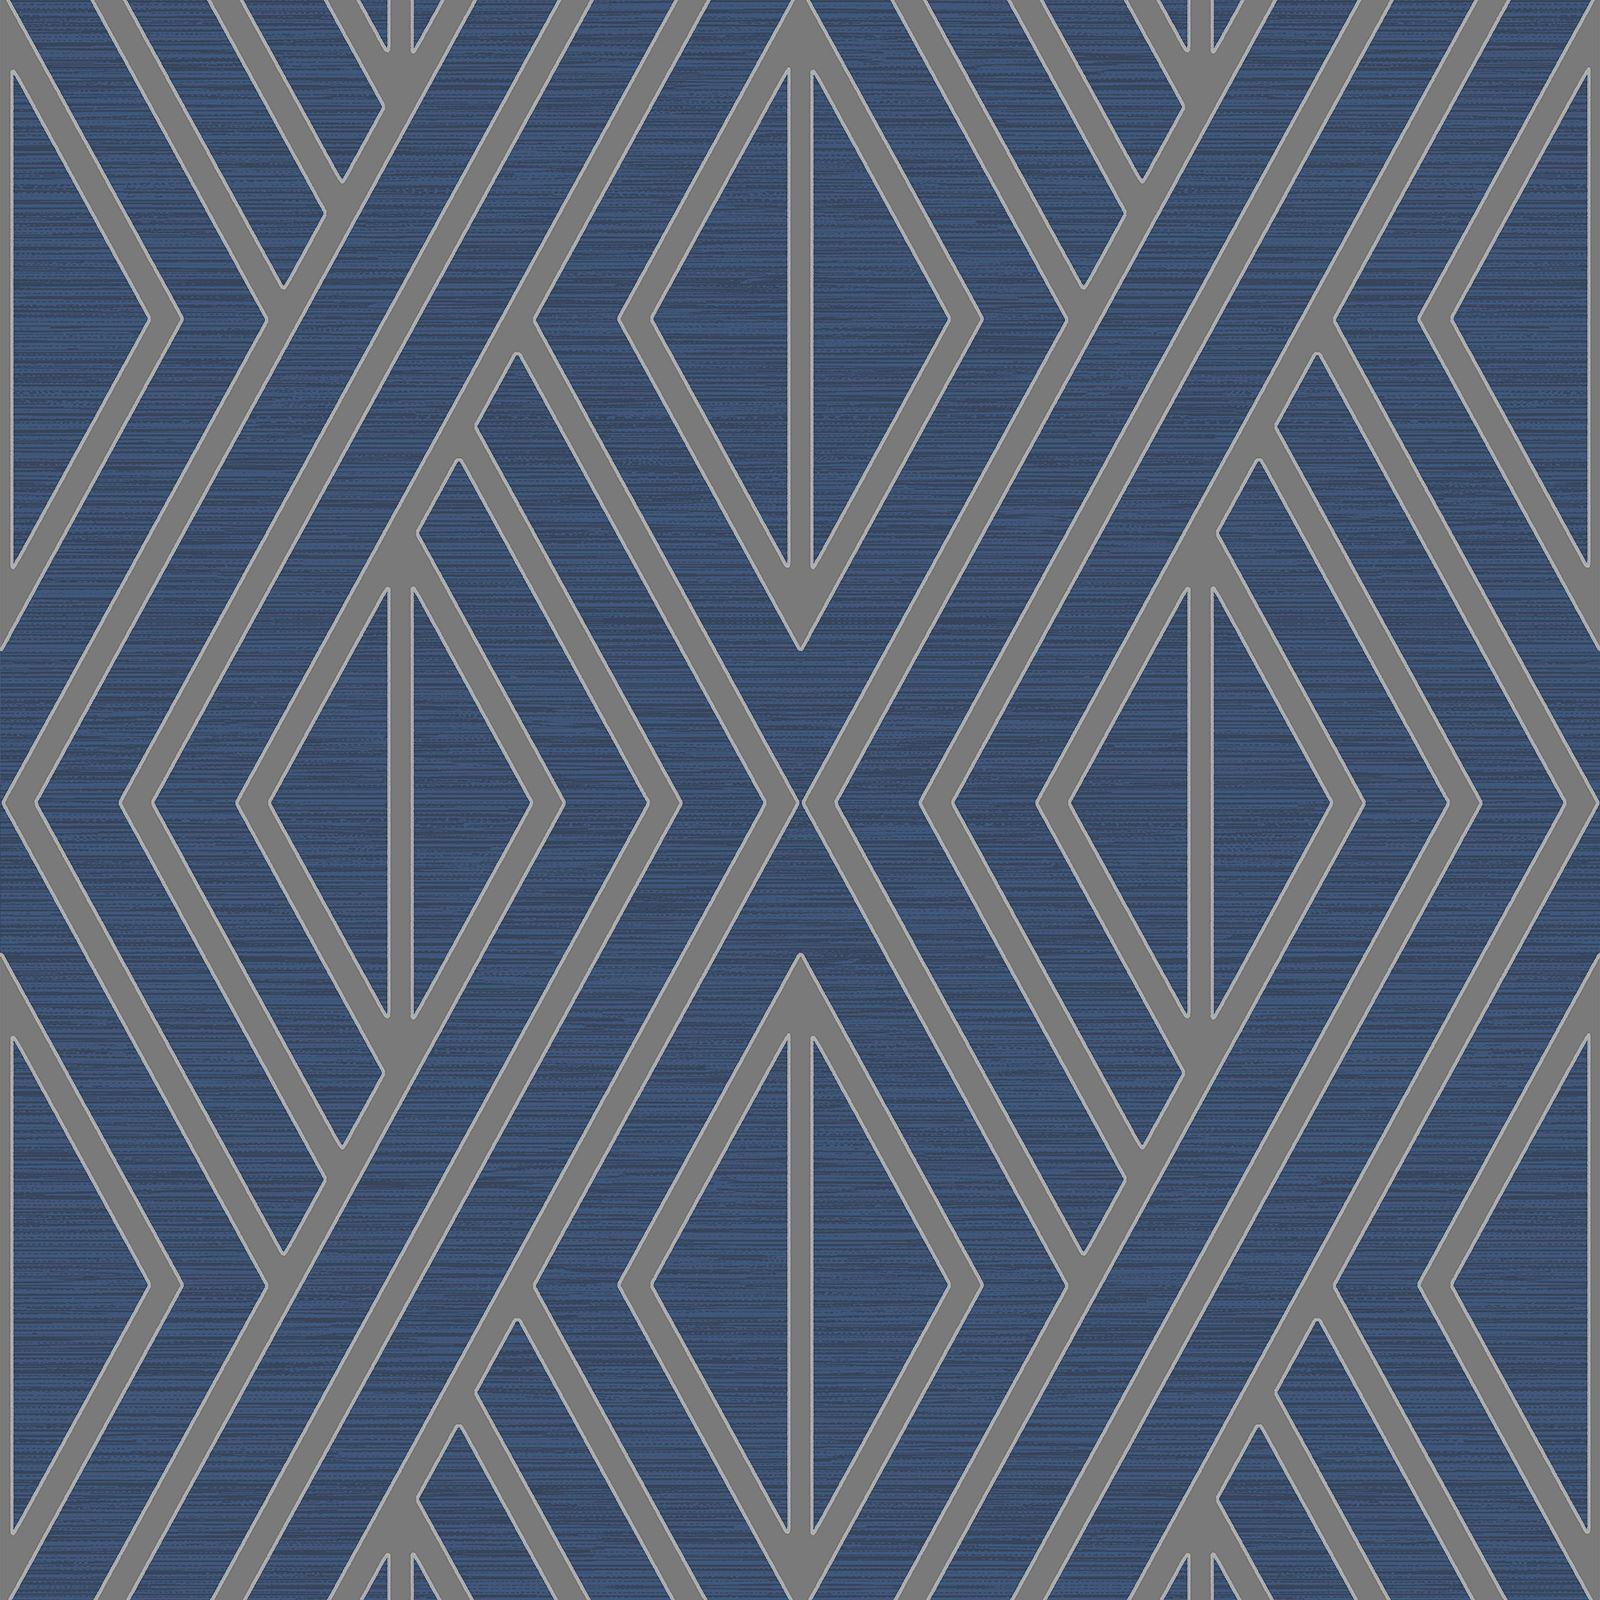 miniatura 53 - Carta da Parati Geometrica Arredamento Camera Moderno Vari Disegni e Colori